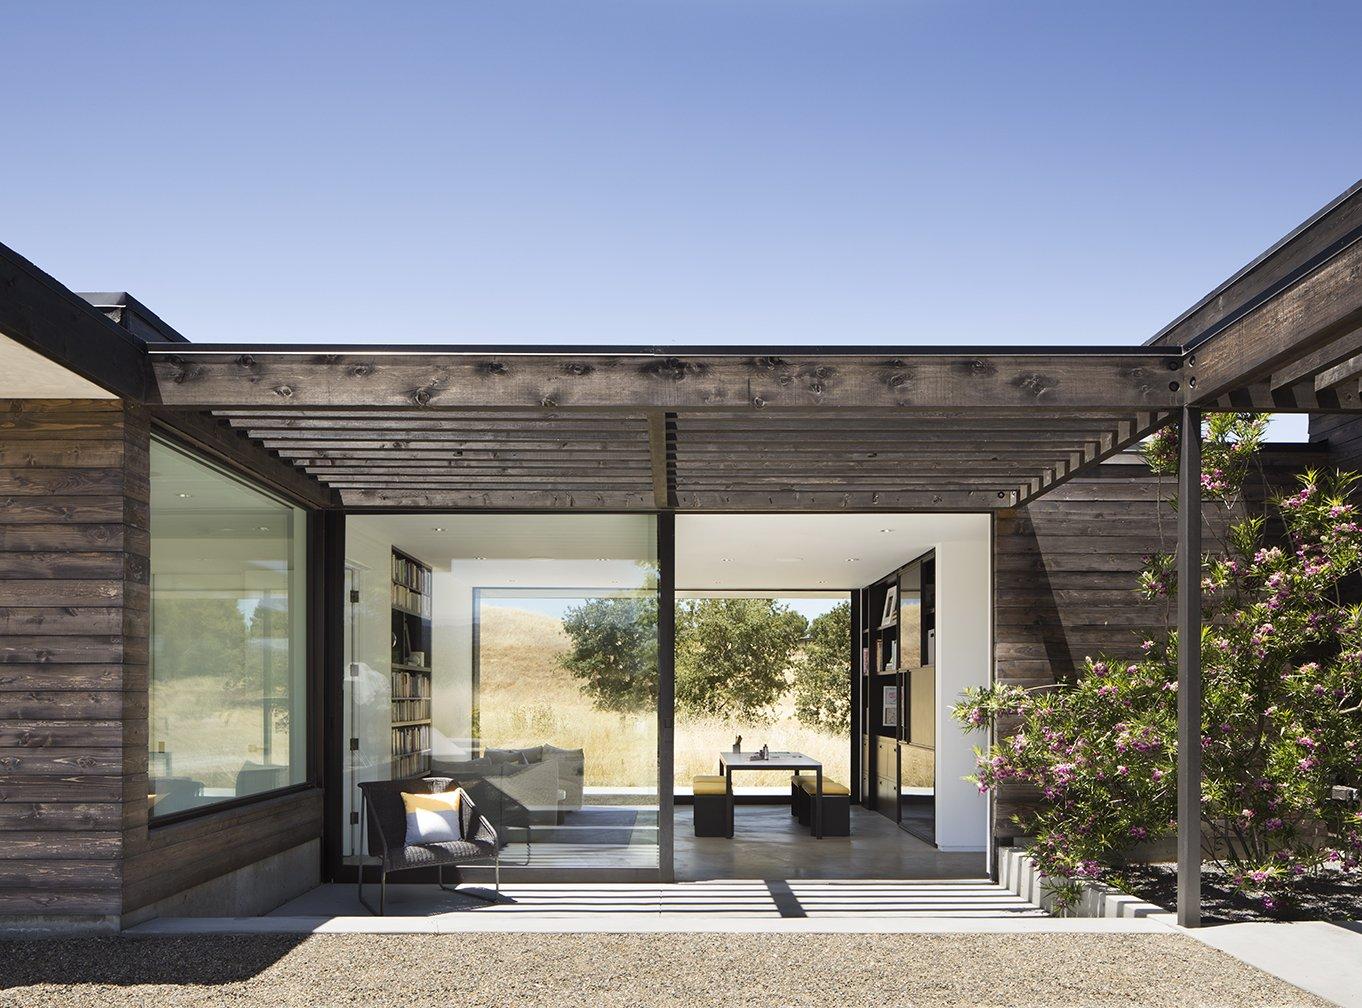 Meadow House courtyard